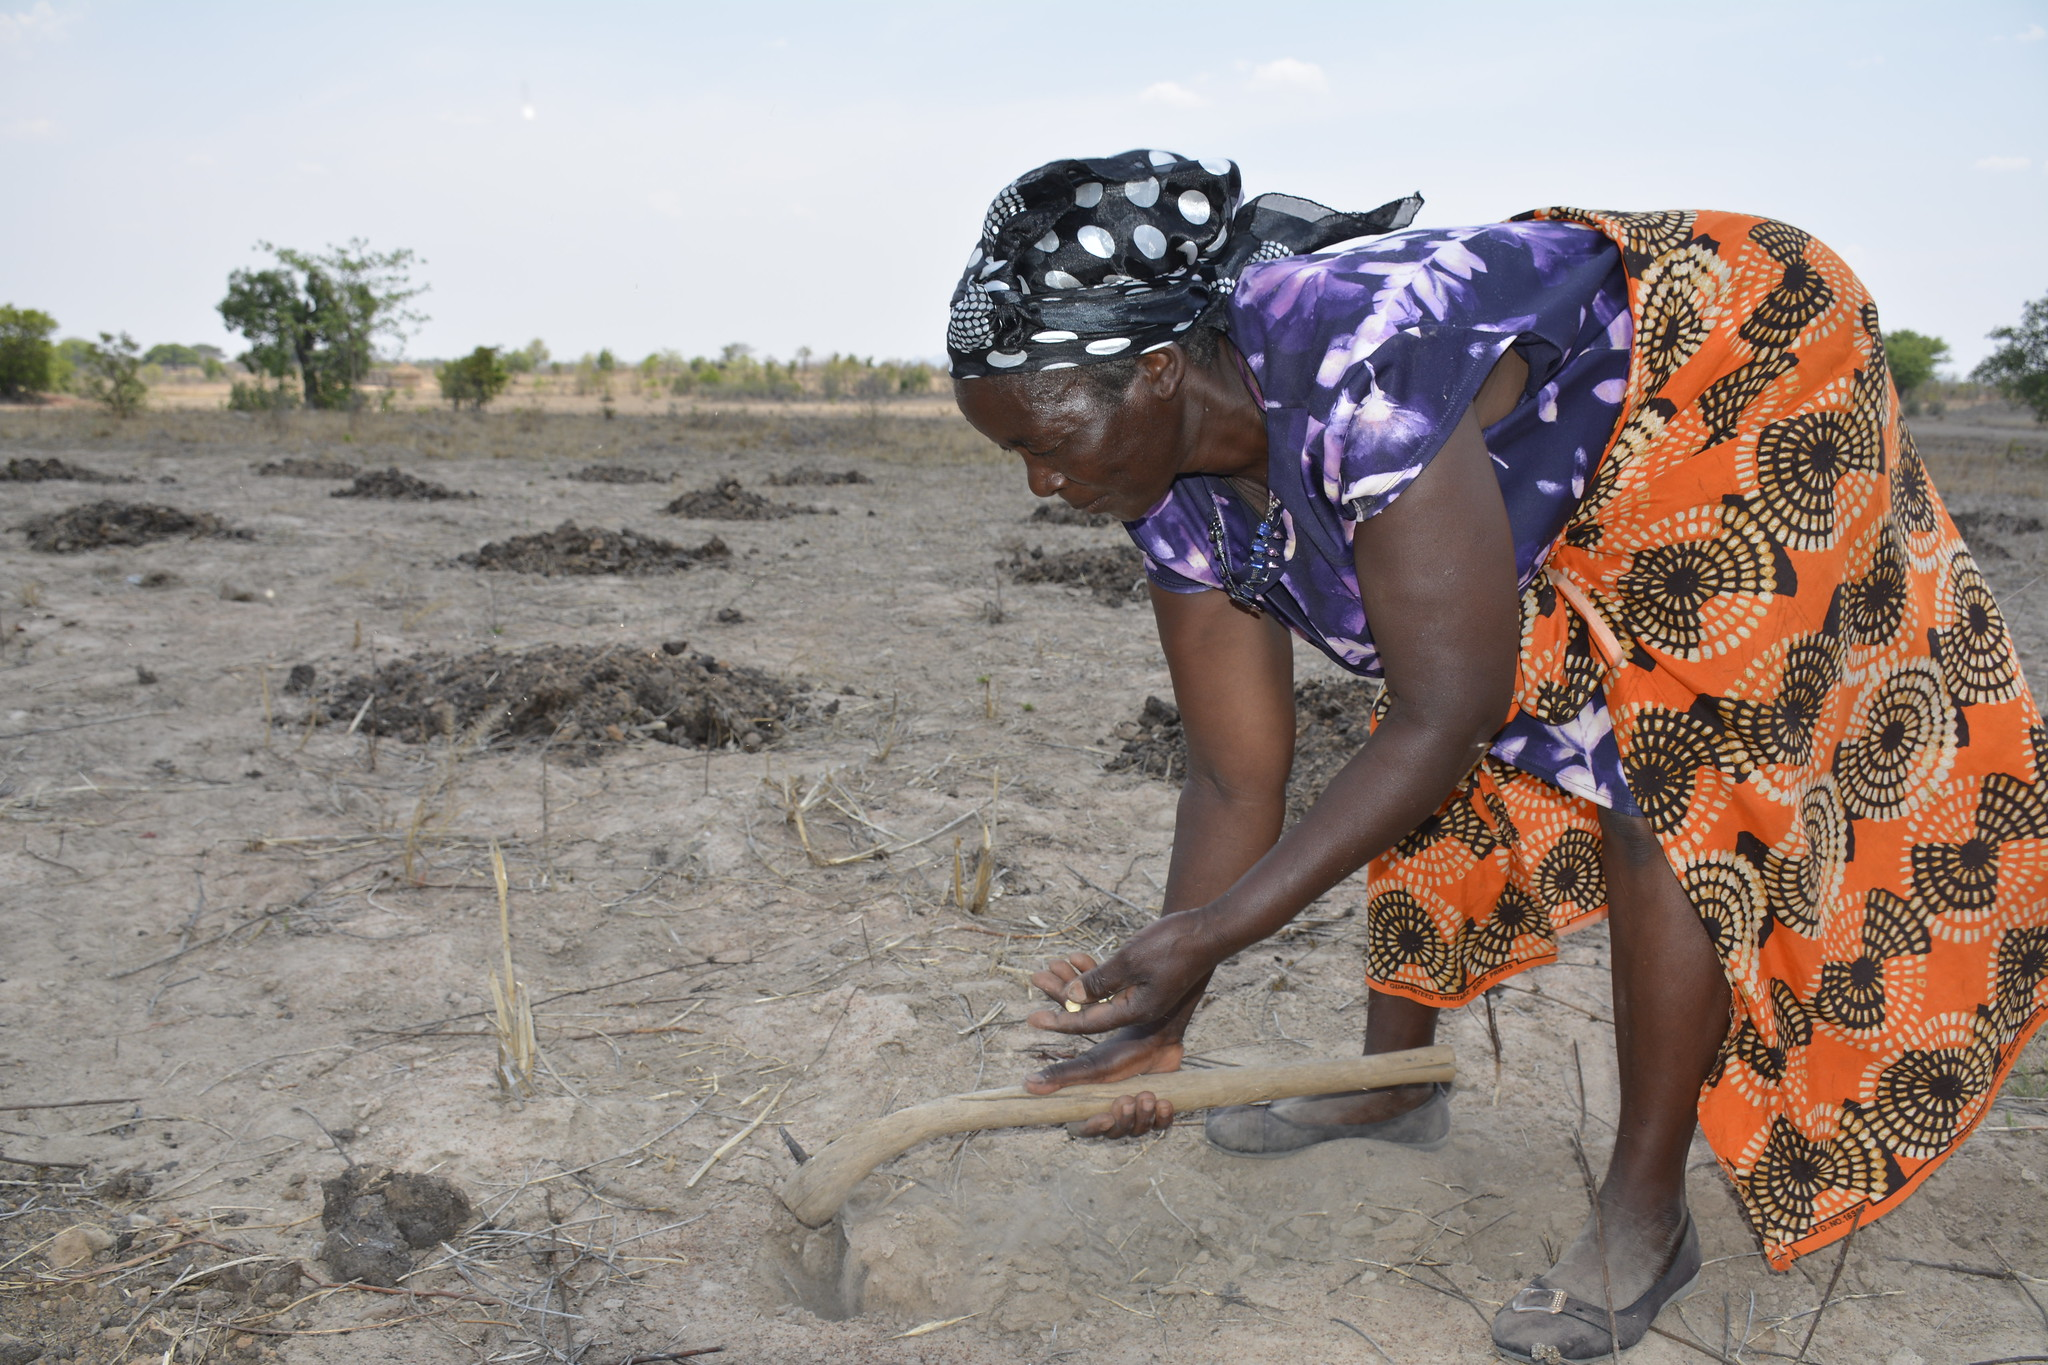 Zimbabwean smallholder farmer Appolonia Marutsvaka, of drought-prone Zaka District, demonstrates planting drought-tolerant and heat stress maize seed. (Photo: Johnson Siamachira/CIMMYT)